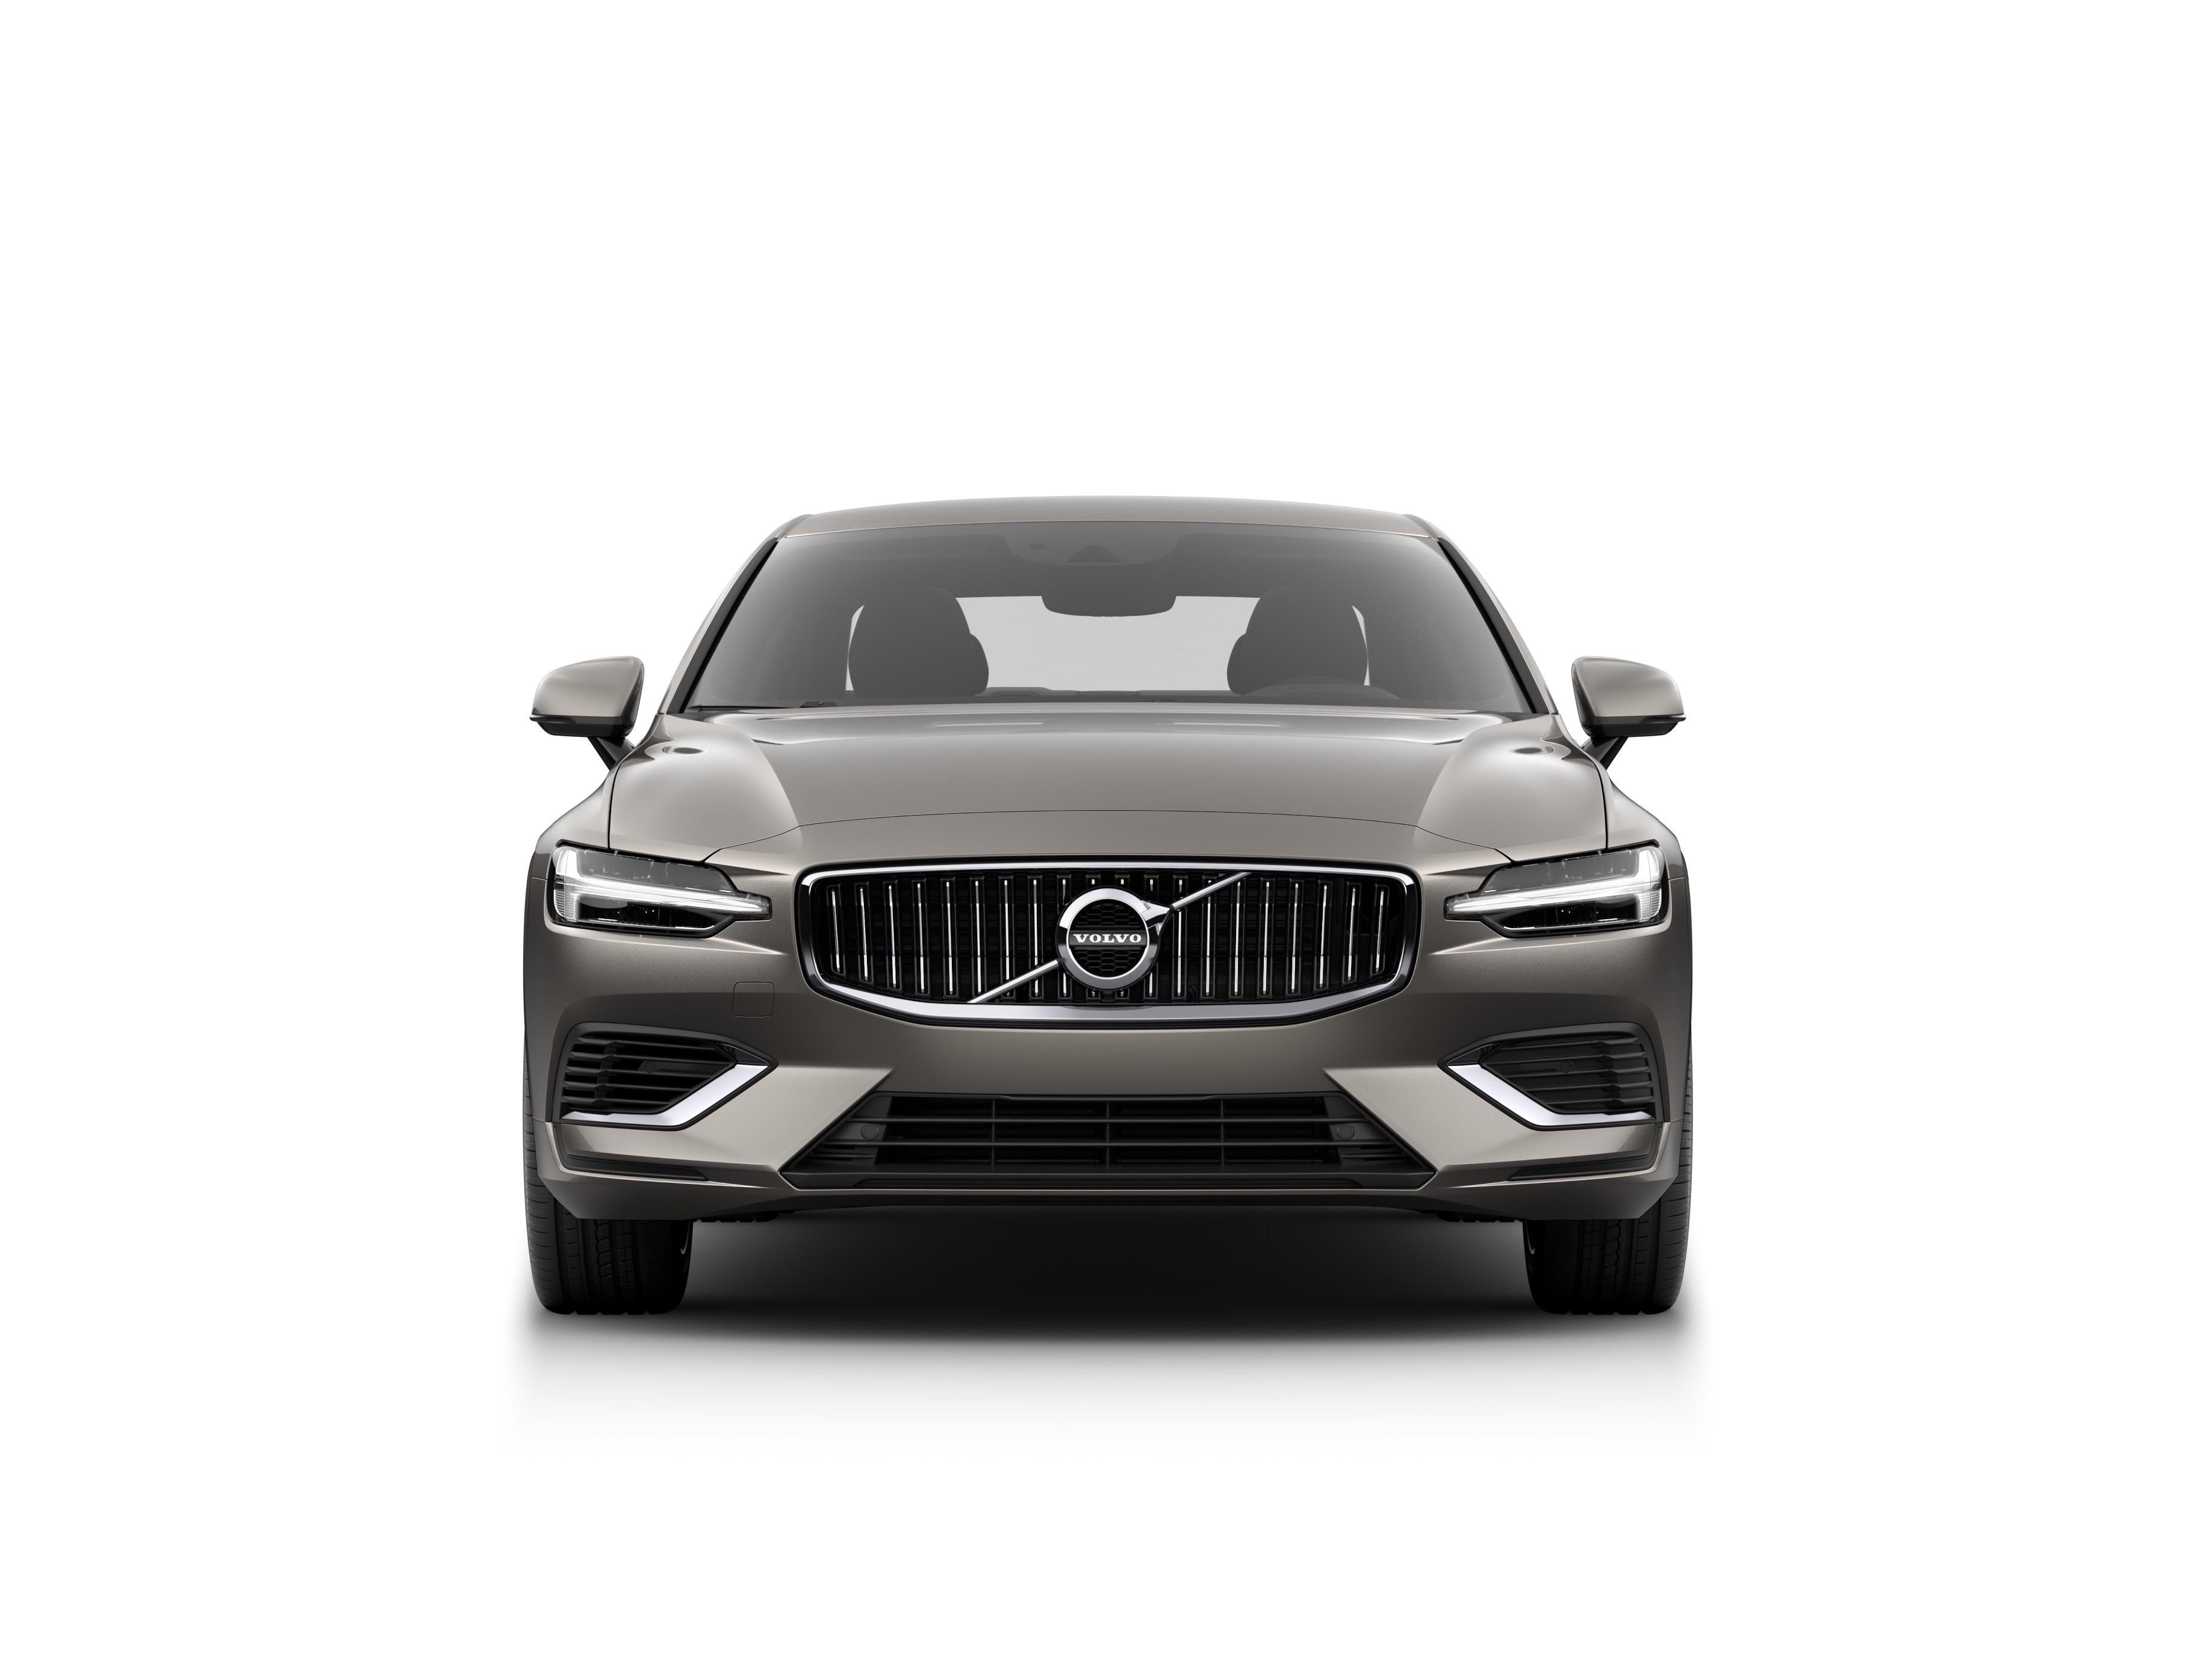 Volvo S60 Recharge 插電式混合動力轎車的正面。